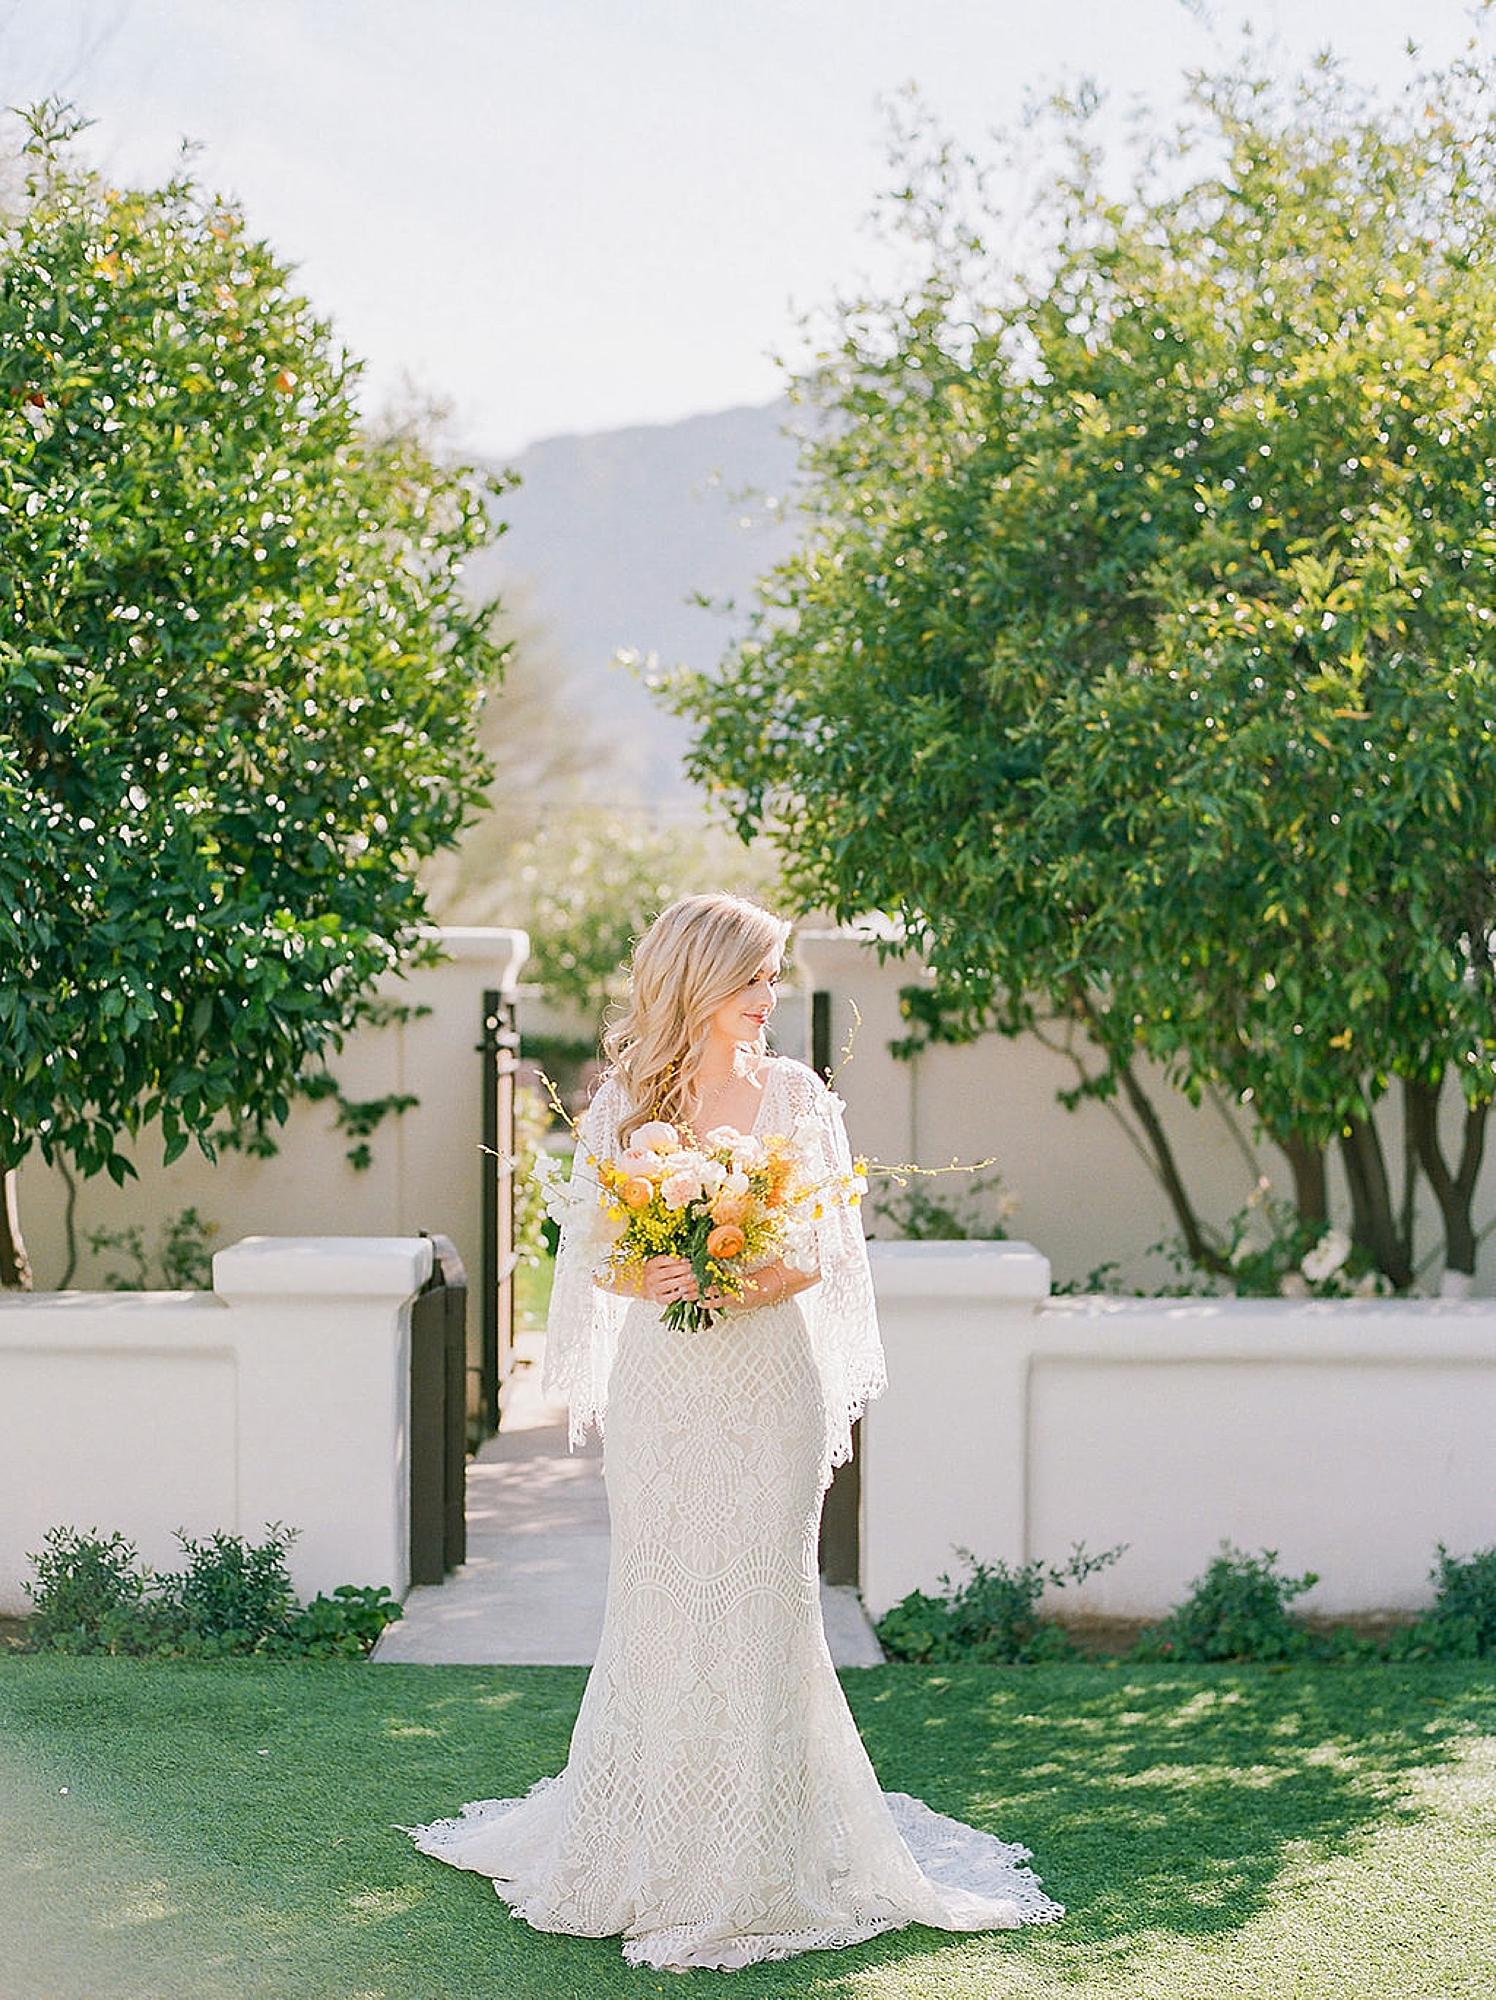 El Chorro Sedona AZ Wedding Photography by Magi Fisher of Magdalena Studios 0015